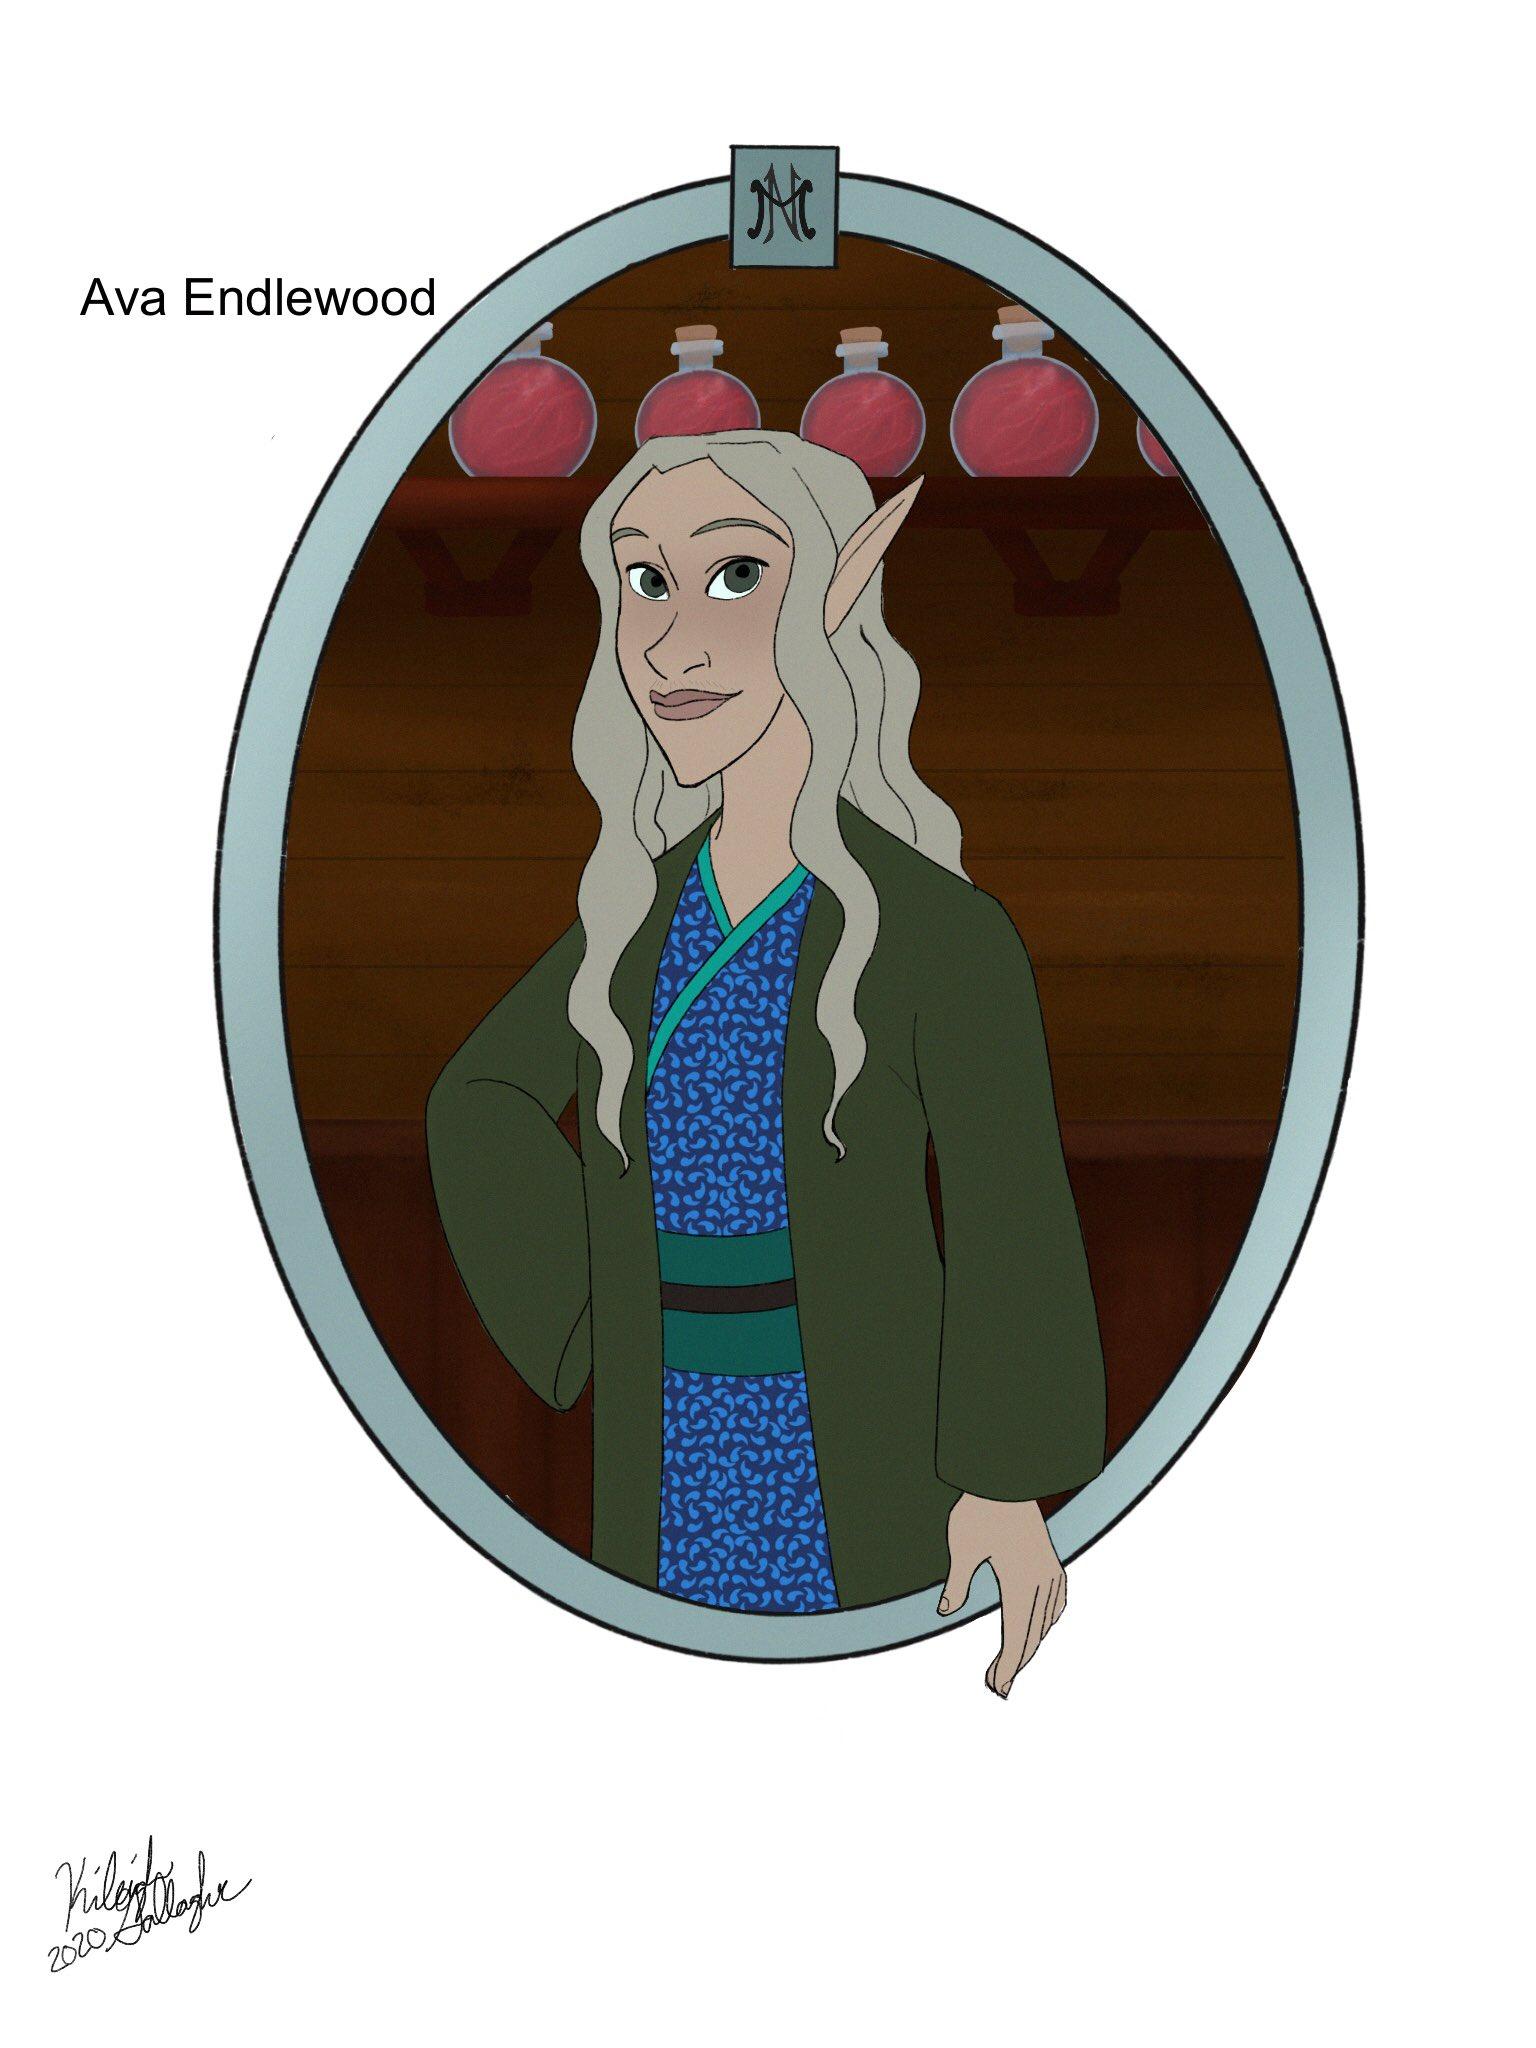 Ava Endlewood